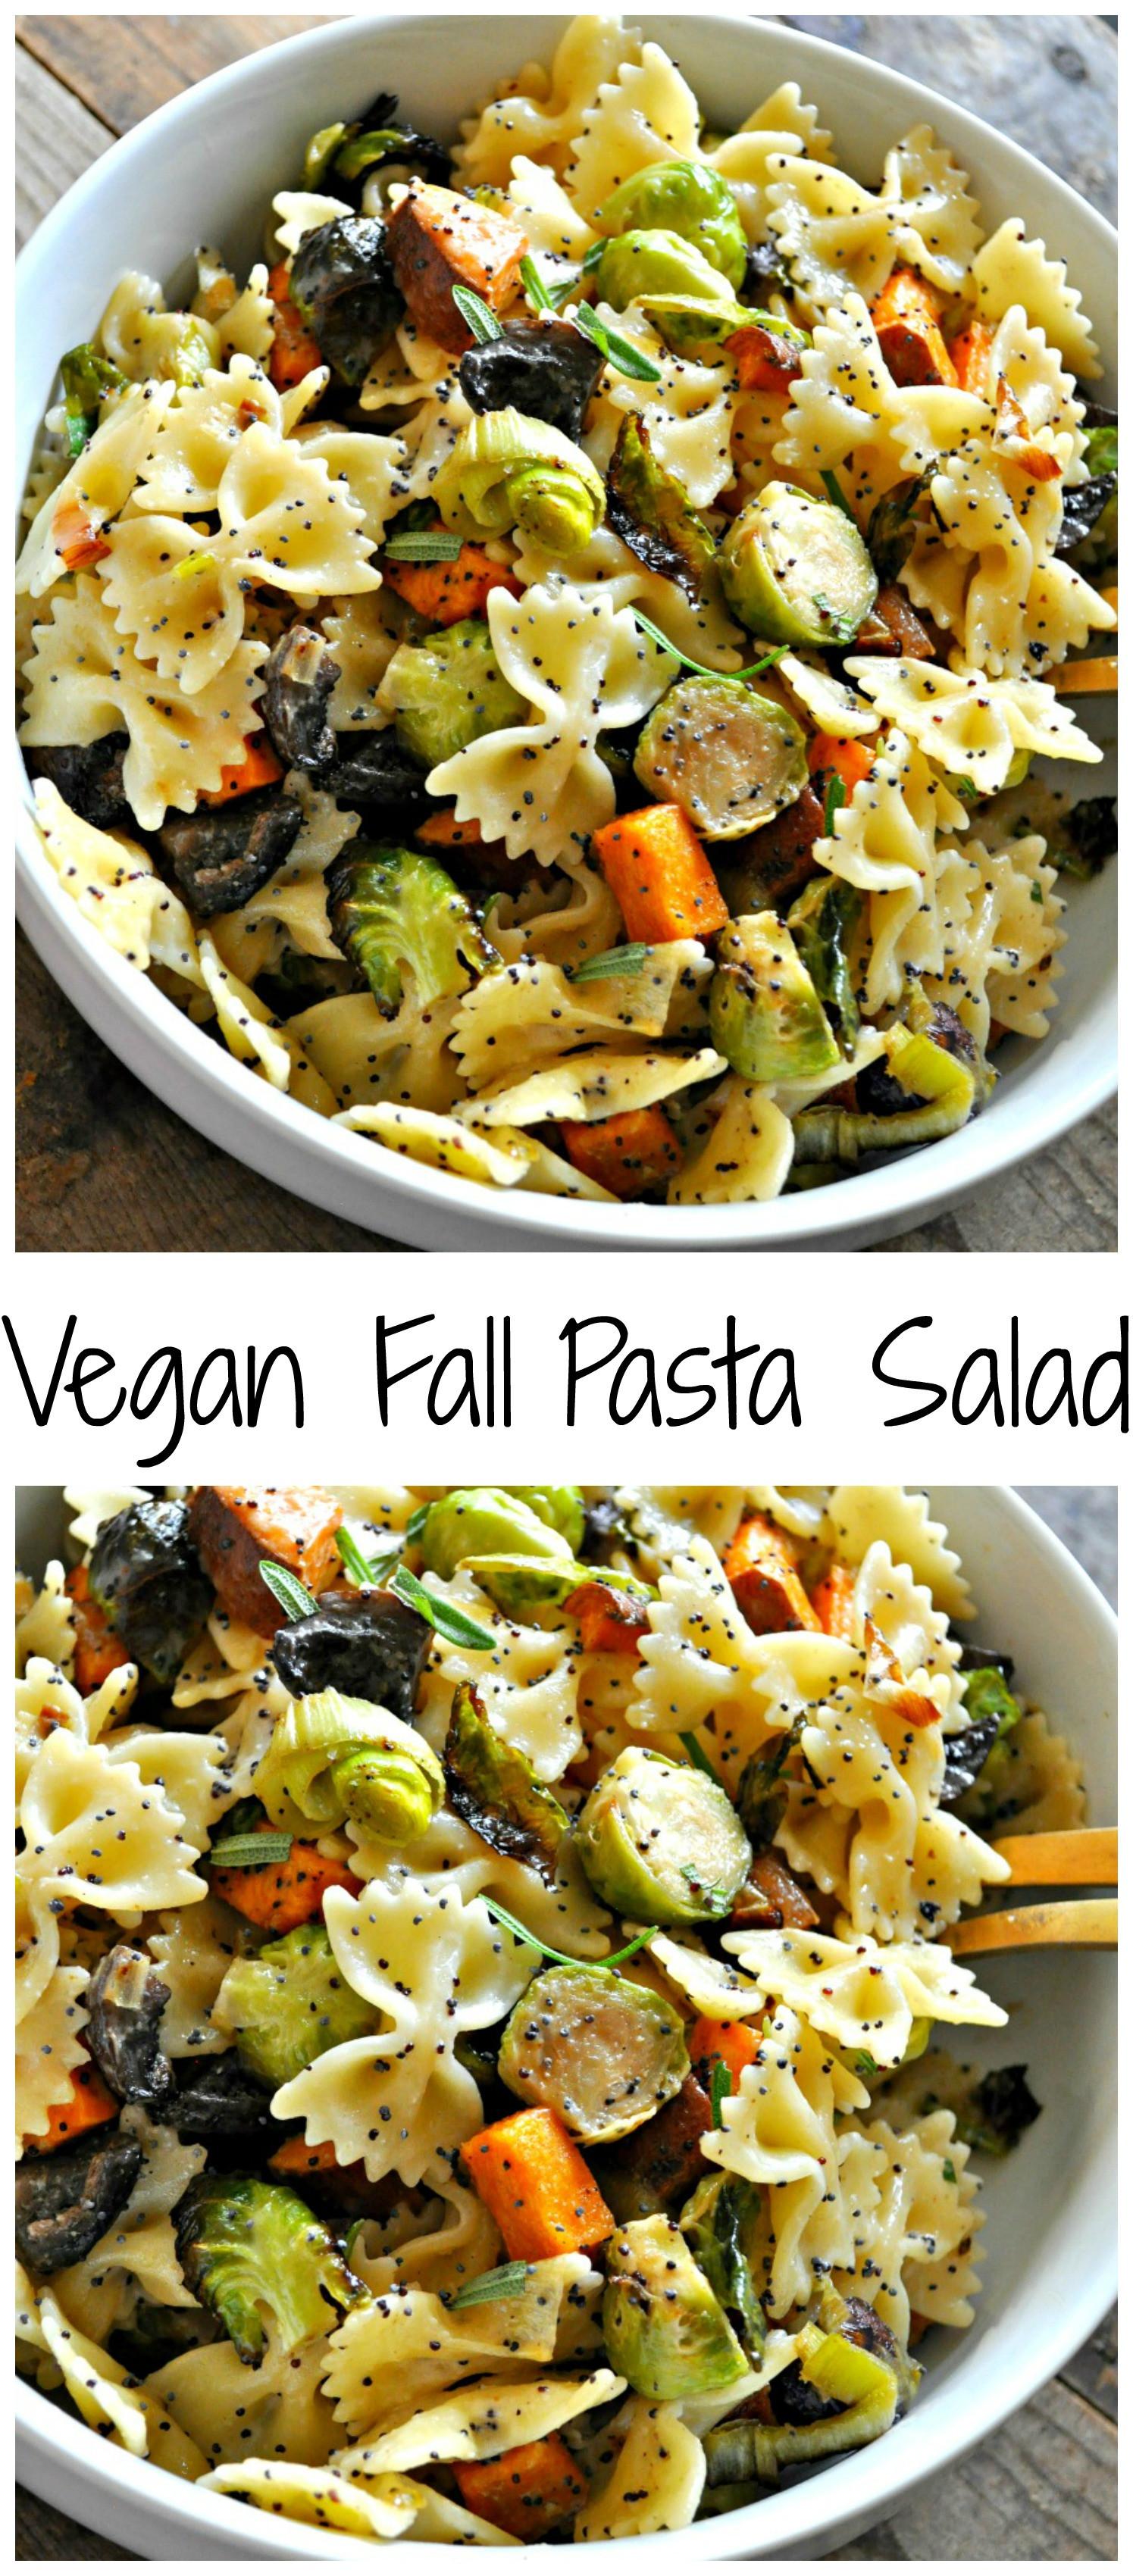 Fall Pasta Salad  Vegan Fall Pasta Salad Rabbit and Wolves